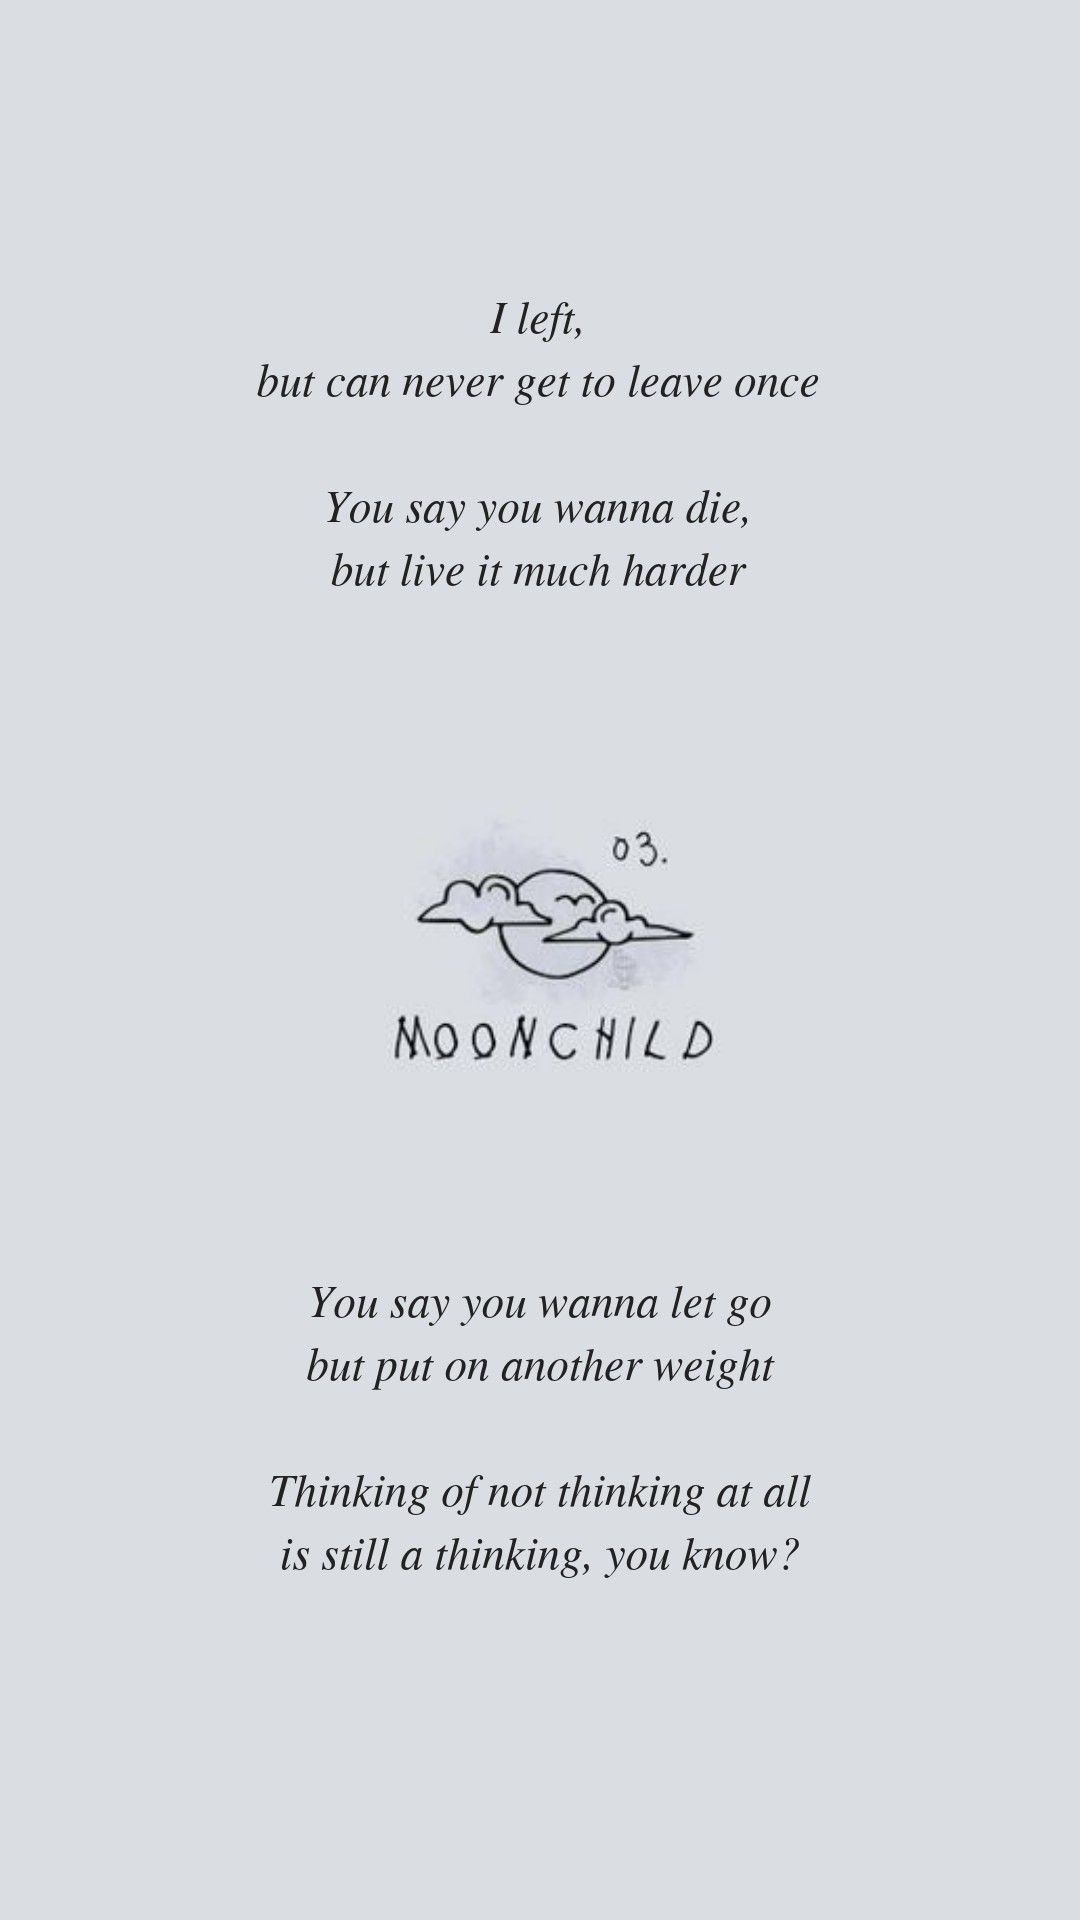 Free Download Moonchild By Bts Rm Lyrics Wallpaper Follow My